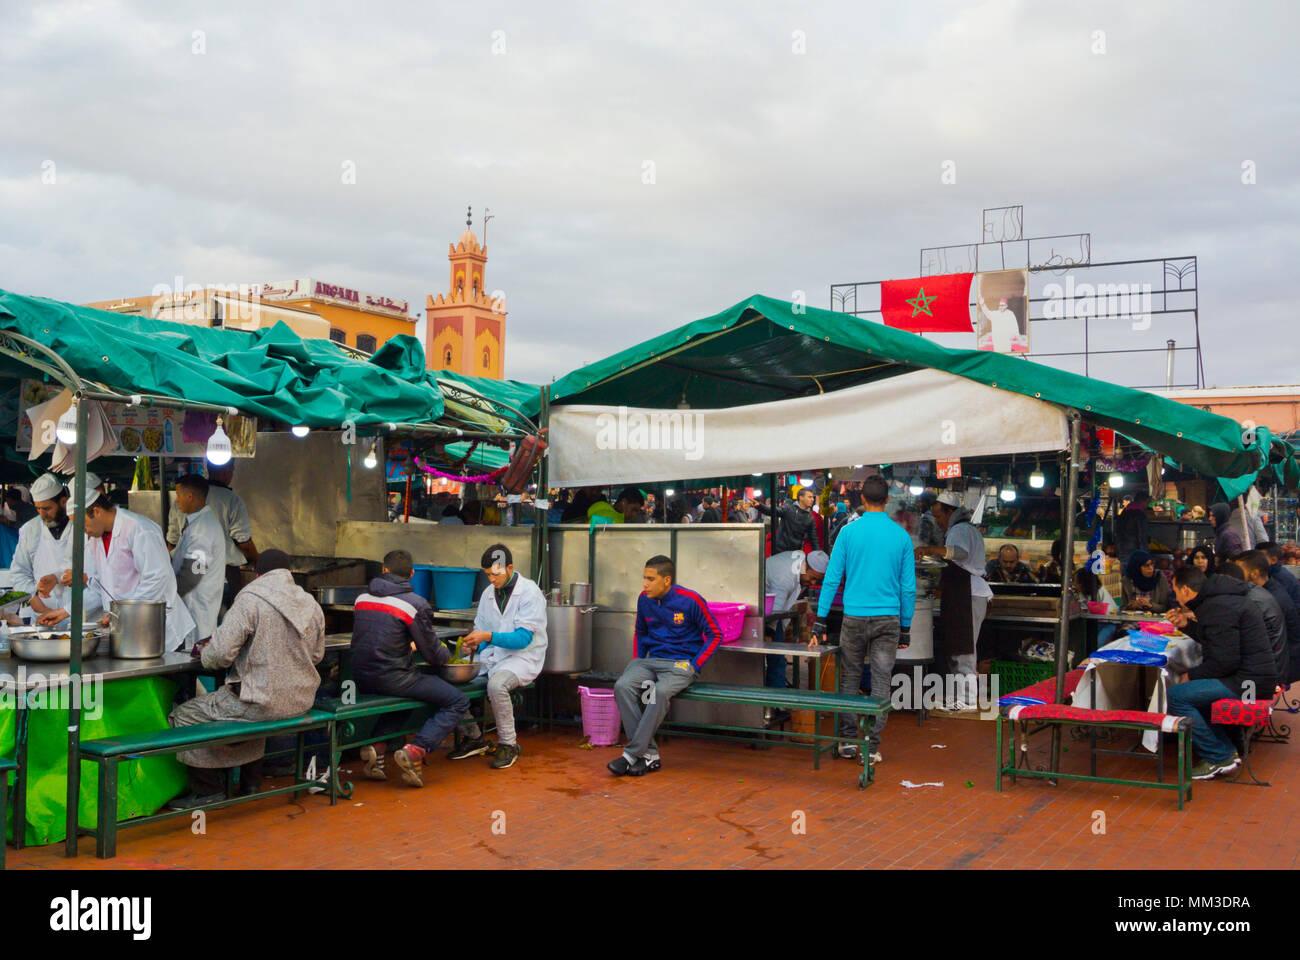 Food stall, Jamaa el Fna, Marrakesh, Morocco, northern Africa - Stock Photo